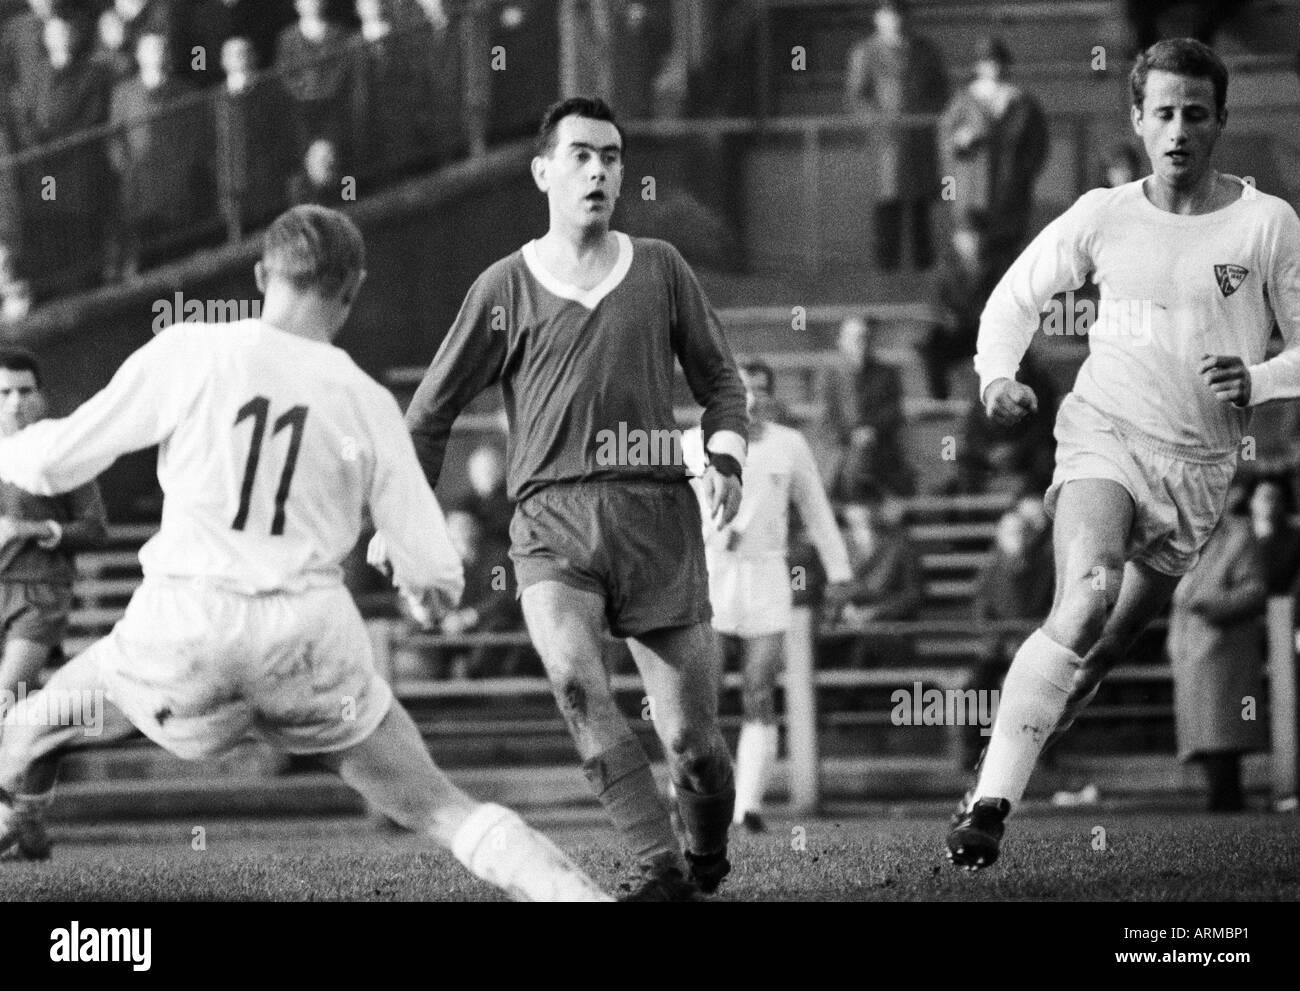 football, Regionalliga West, 1966/1967, VfL Bochum versus Westfalia Herne 1:0, Stadium at the Castroper Strasse in Bochum, scene of the match, f.l.t.r. Hans Grieger (VfL, 11), Guenter Graetsch (Herne), Guenther Gross (VfL) - Stock Image